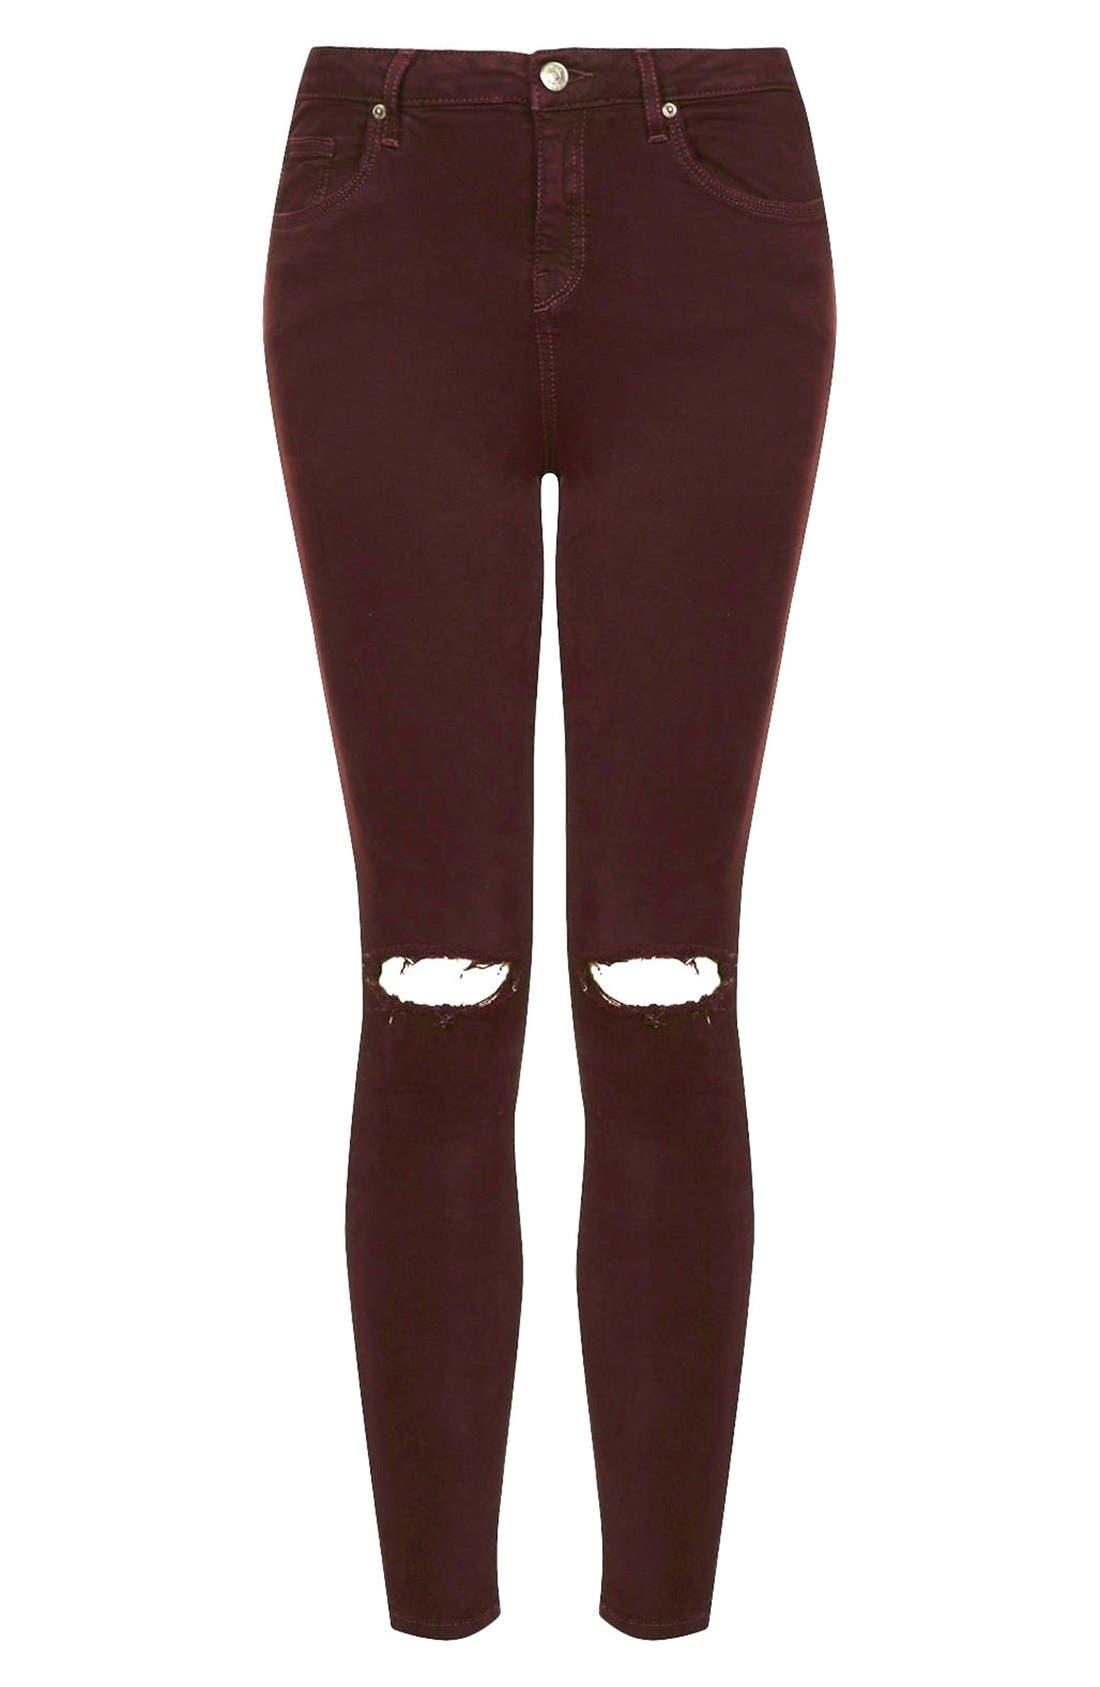 Alternate Image 3  - Topshop Moto 'Jamie' Ripped Jeans (Aubergine)